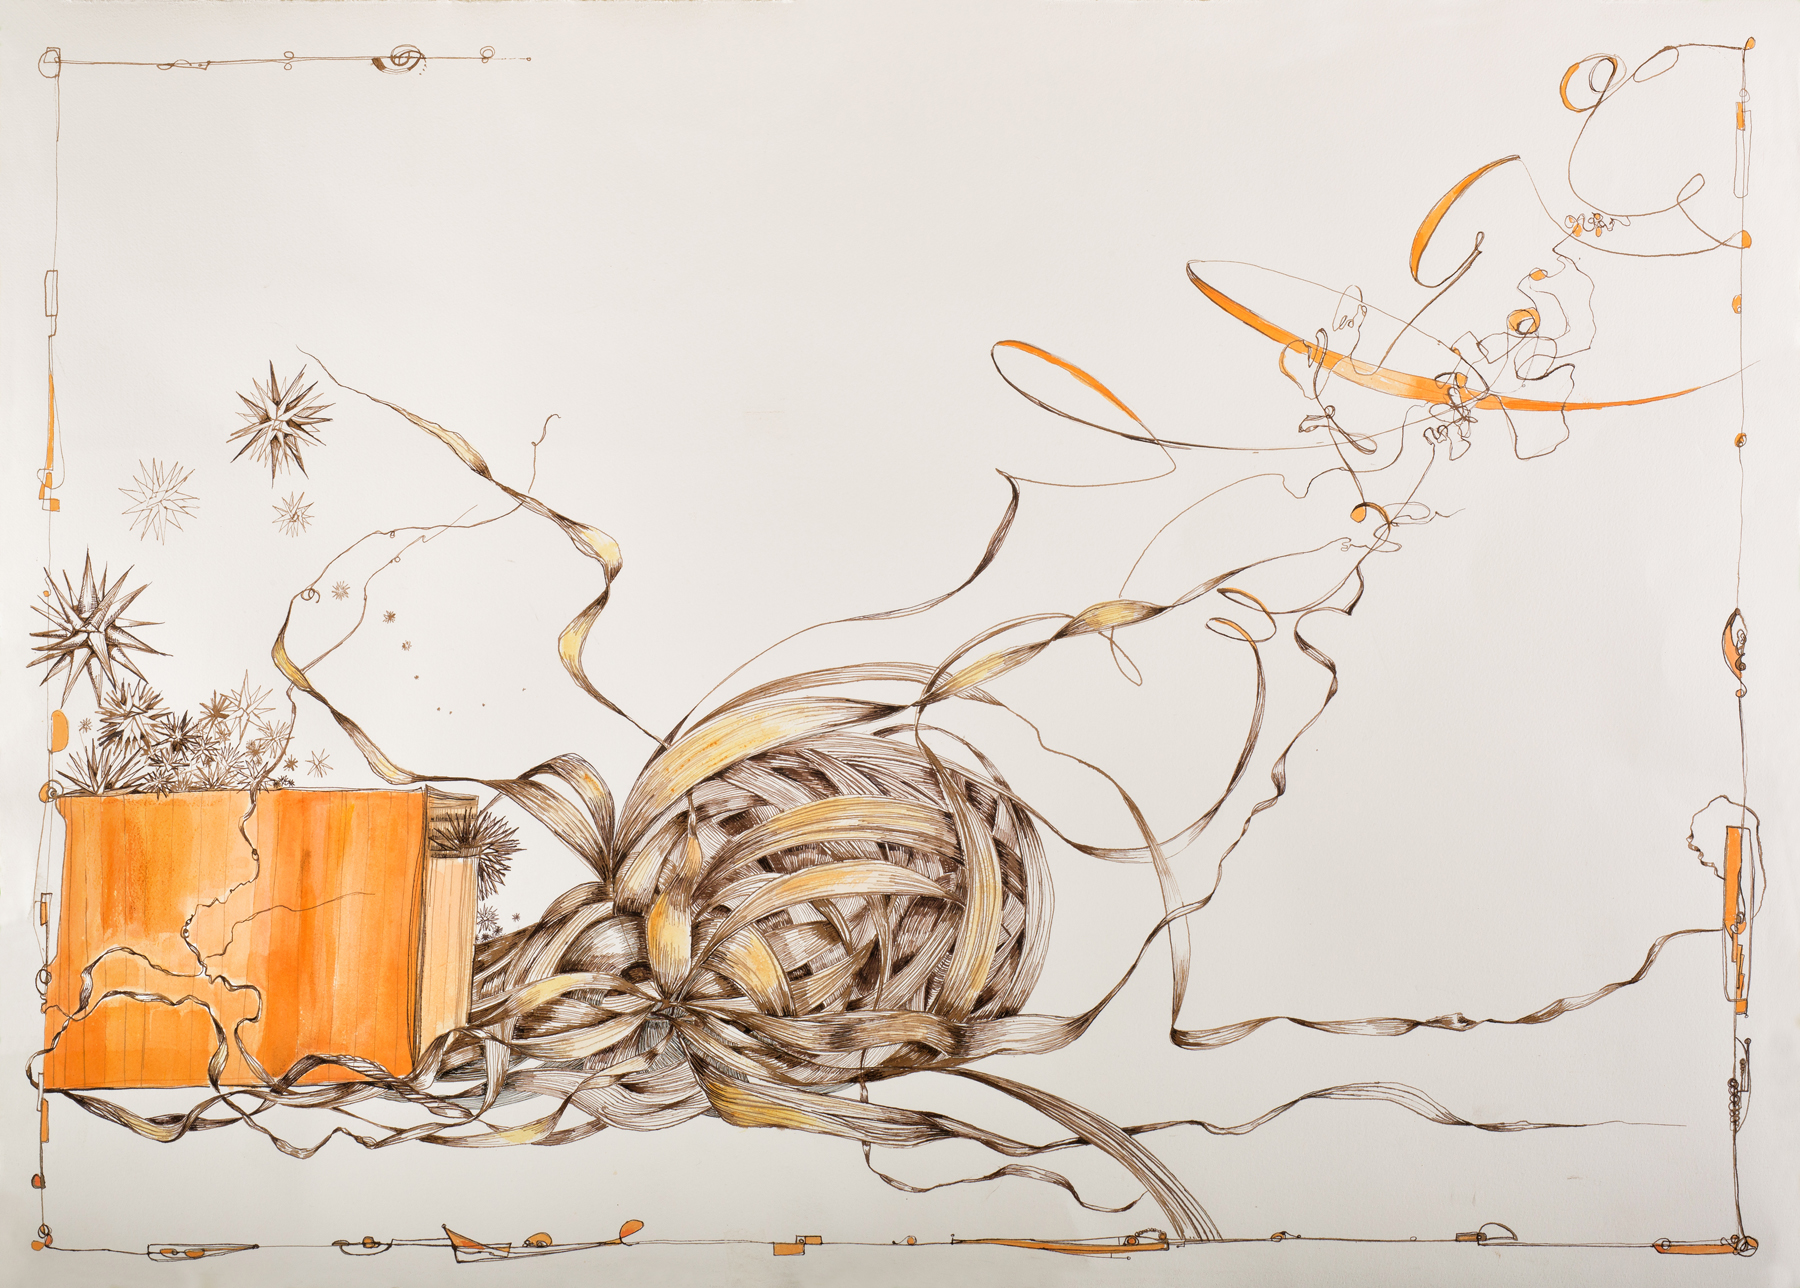 Sarah Alexander,  Impulsive , Walnut ink and watercolor on paper, 45x31